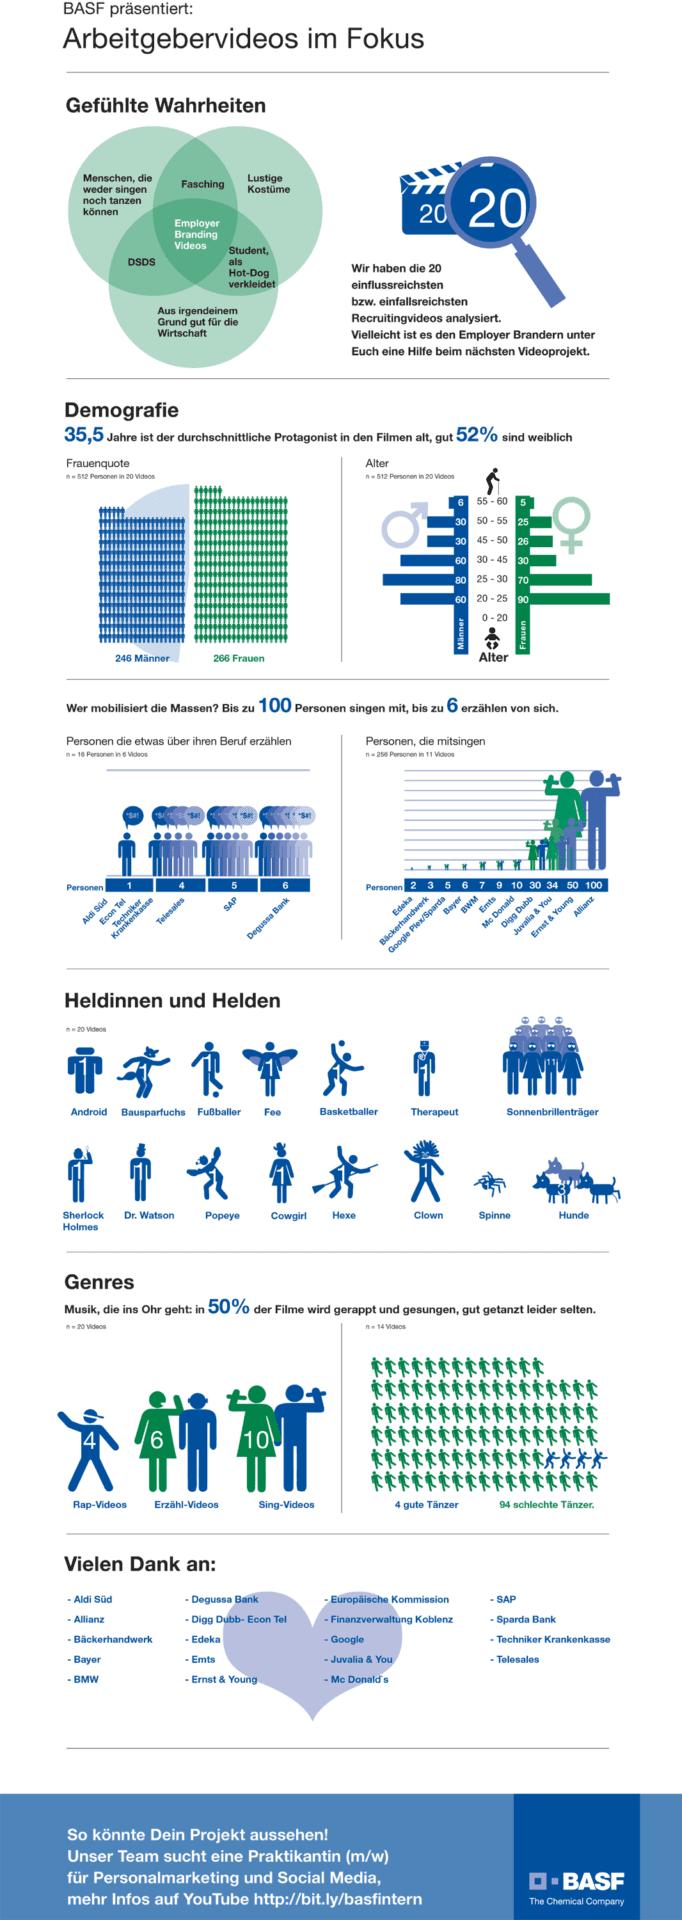 Personalmarketing mit Infografik zu Arbeitgebervideos - BASF sucht Praktikanten - Quelle BASF